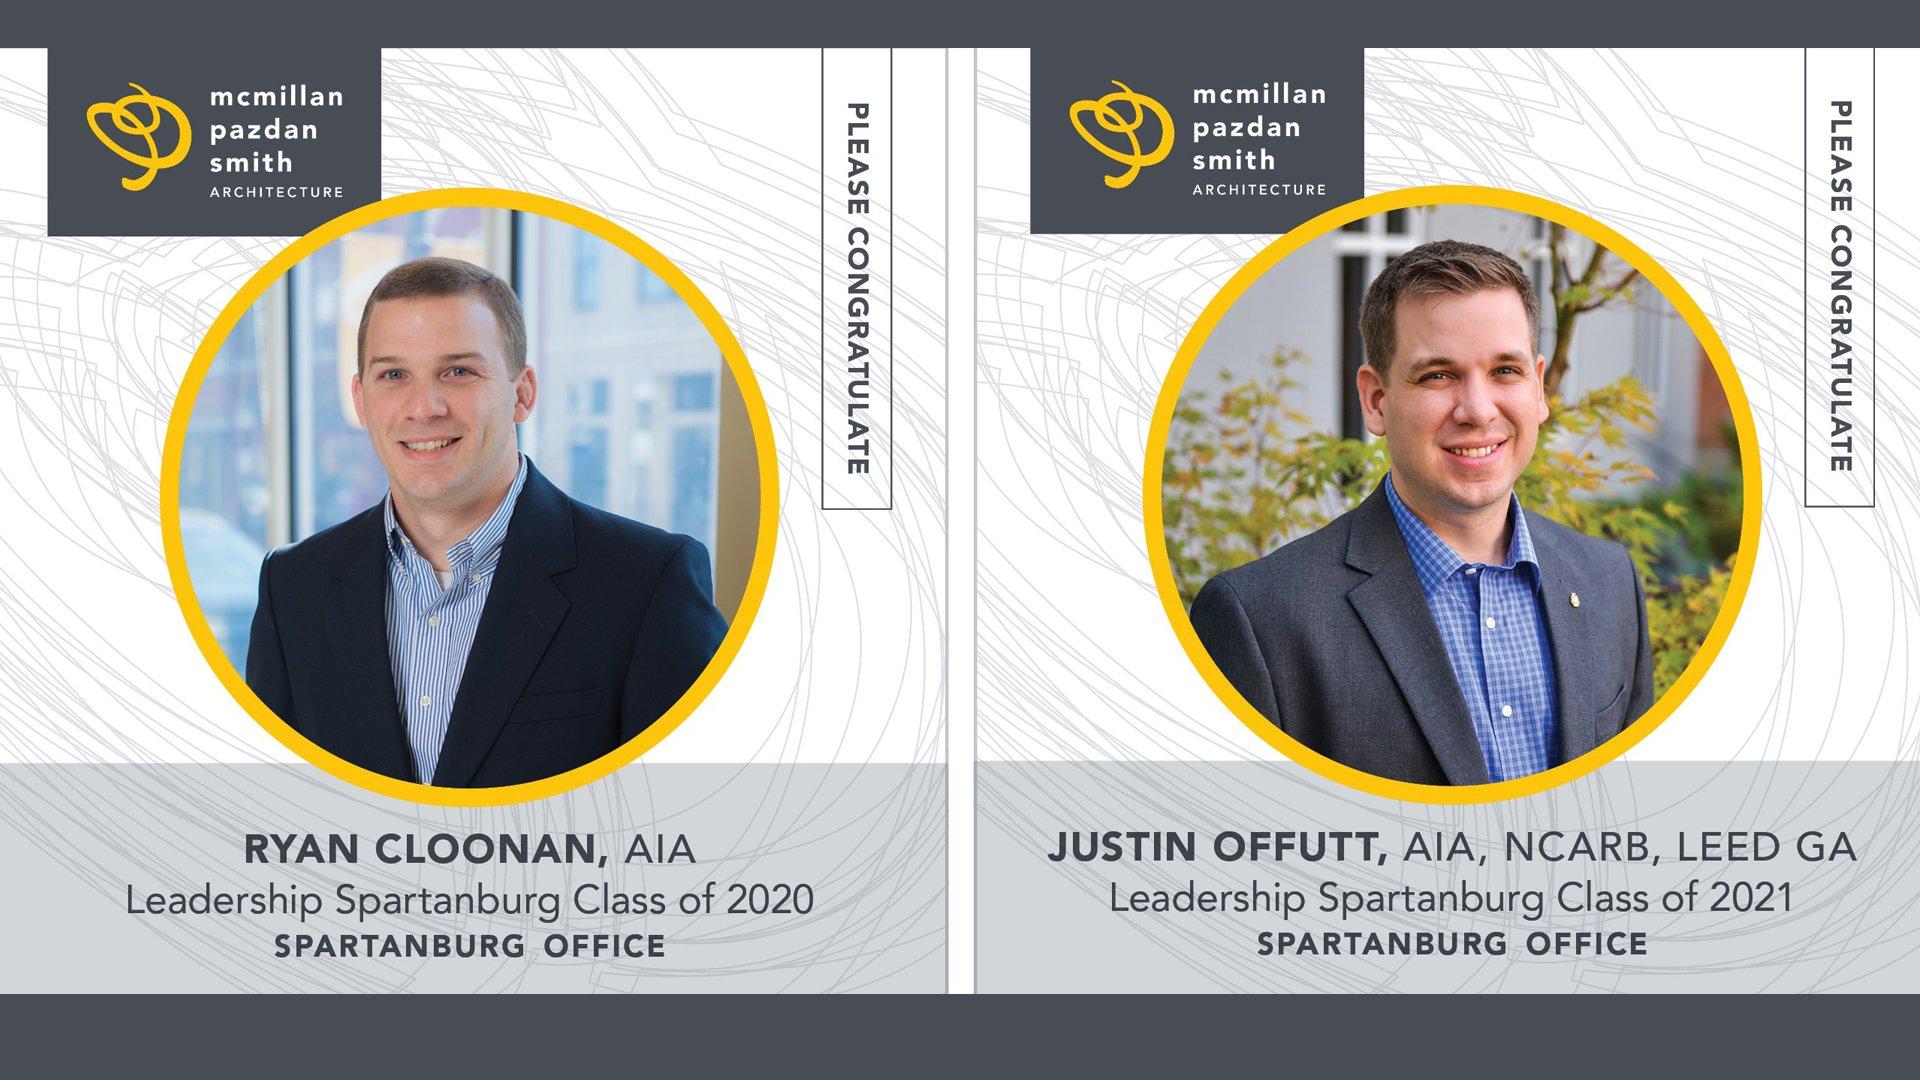 Ryan Cloonan and Justin Offutt Graduate from Leadership Spartanburg